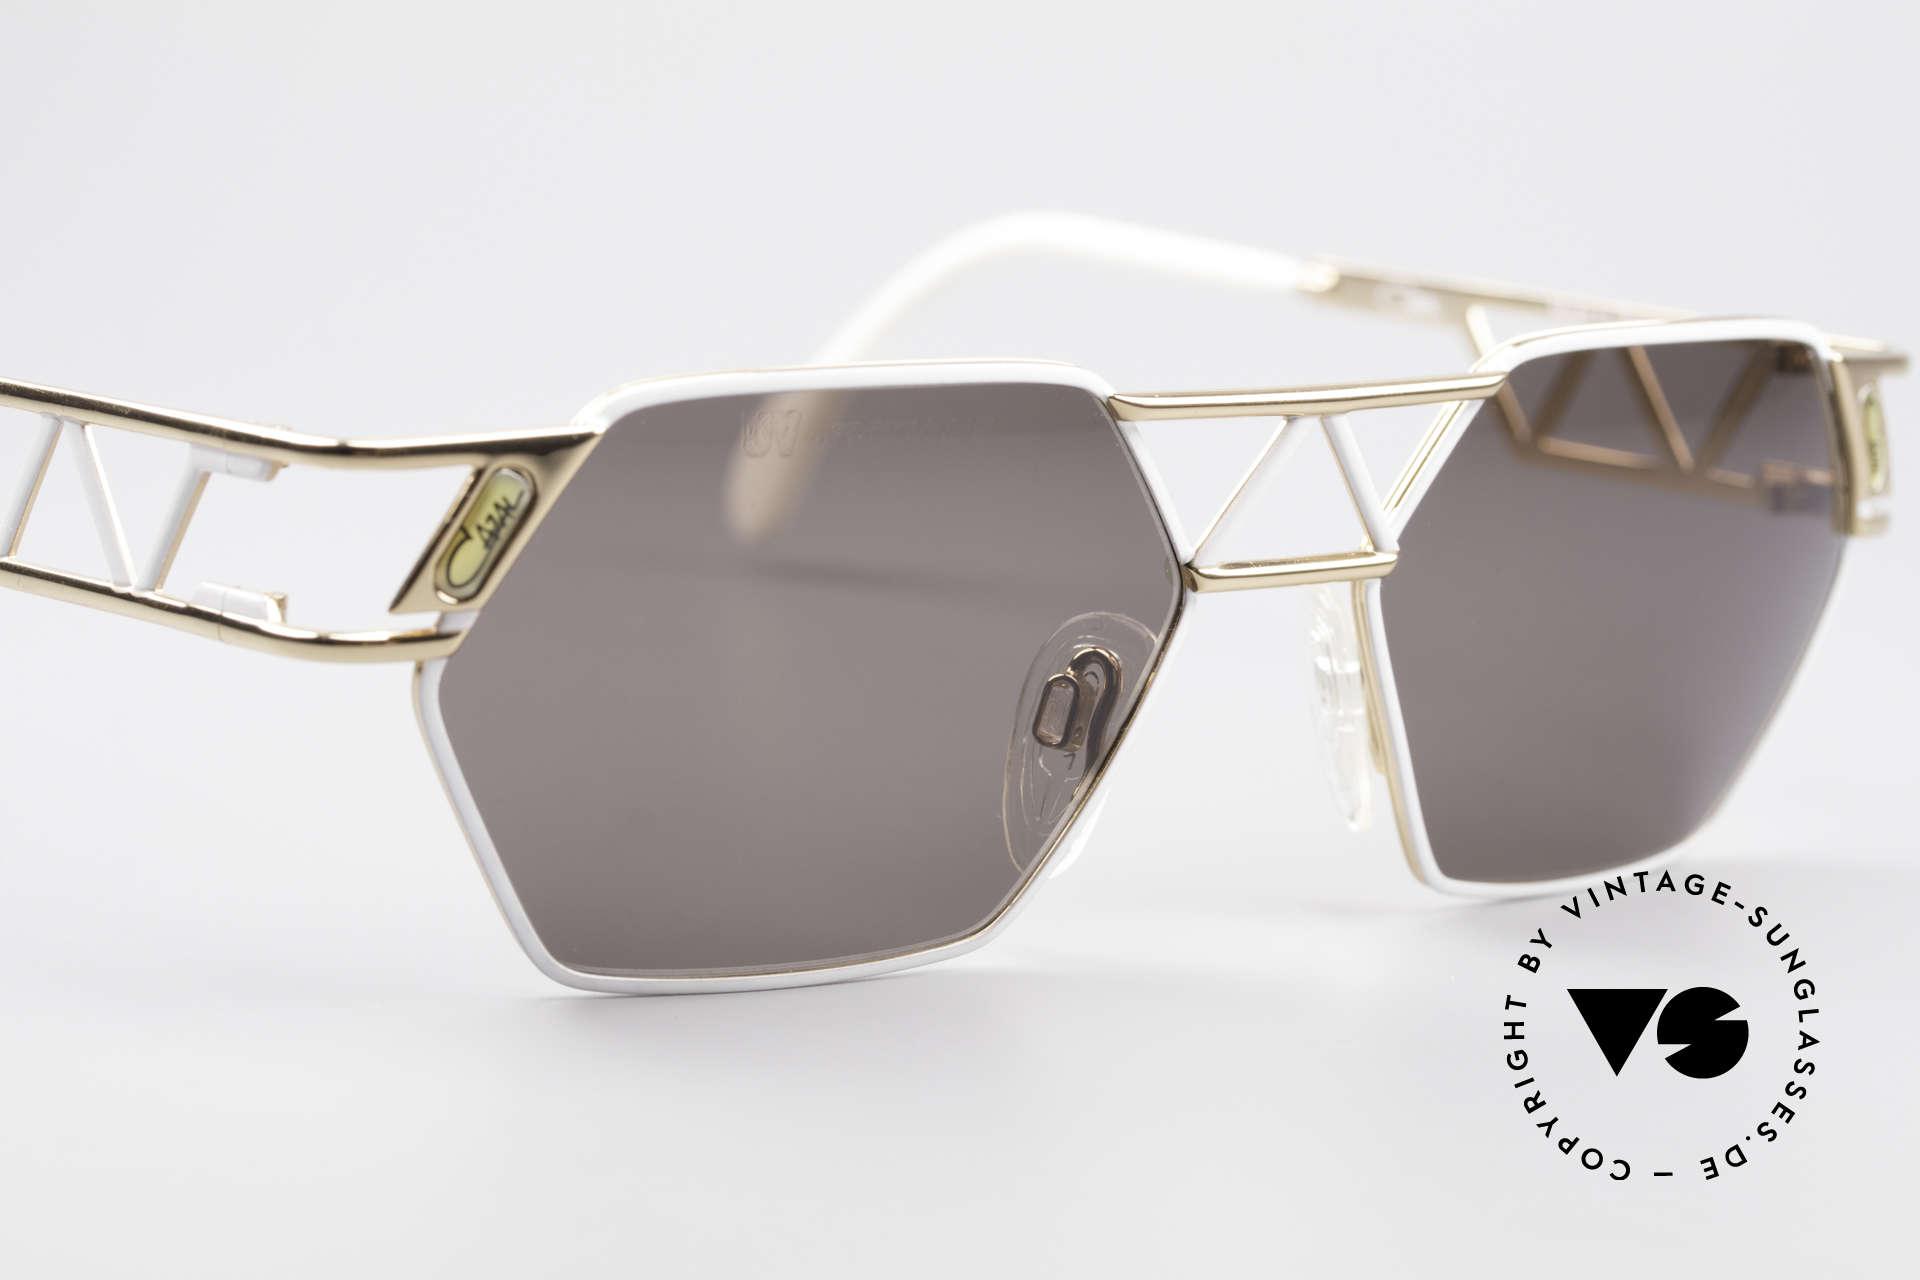 Cazal 960 Rare Designer Sunglasses, NO retro fashion, but a 25 years old Cazal ORIGINAL, Made for Men and Women